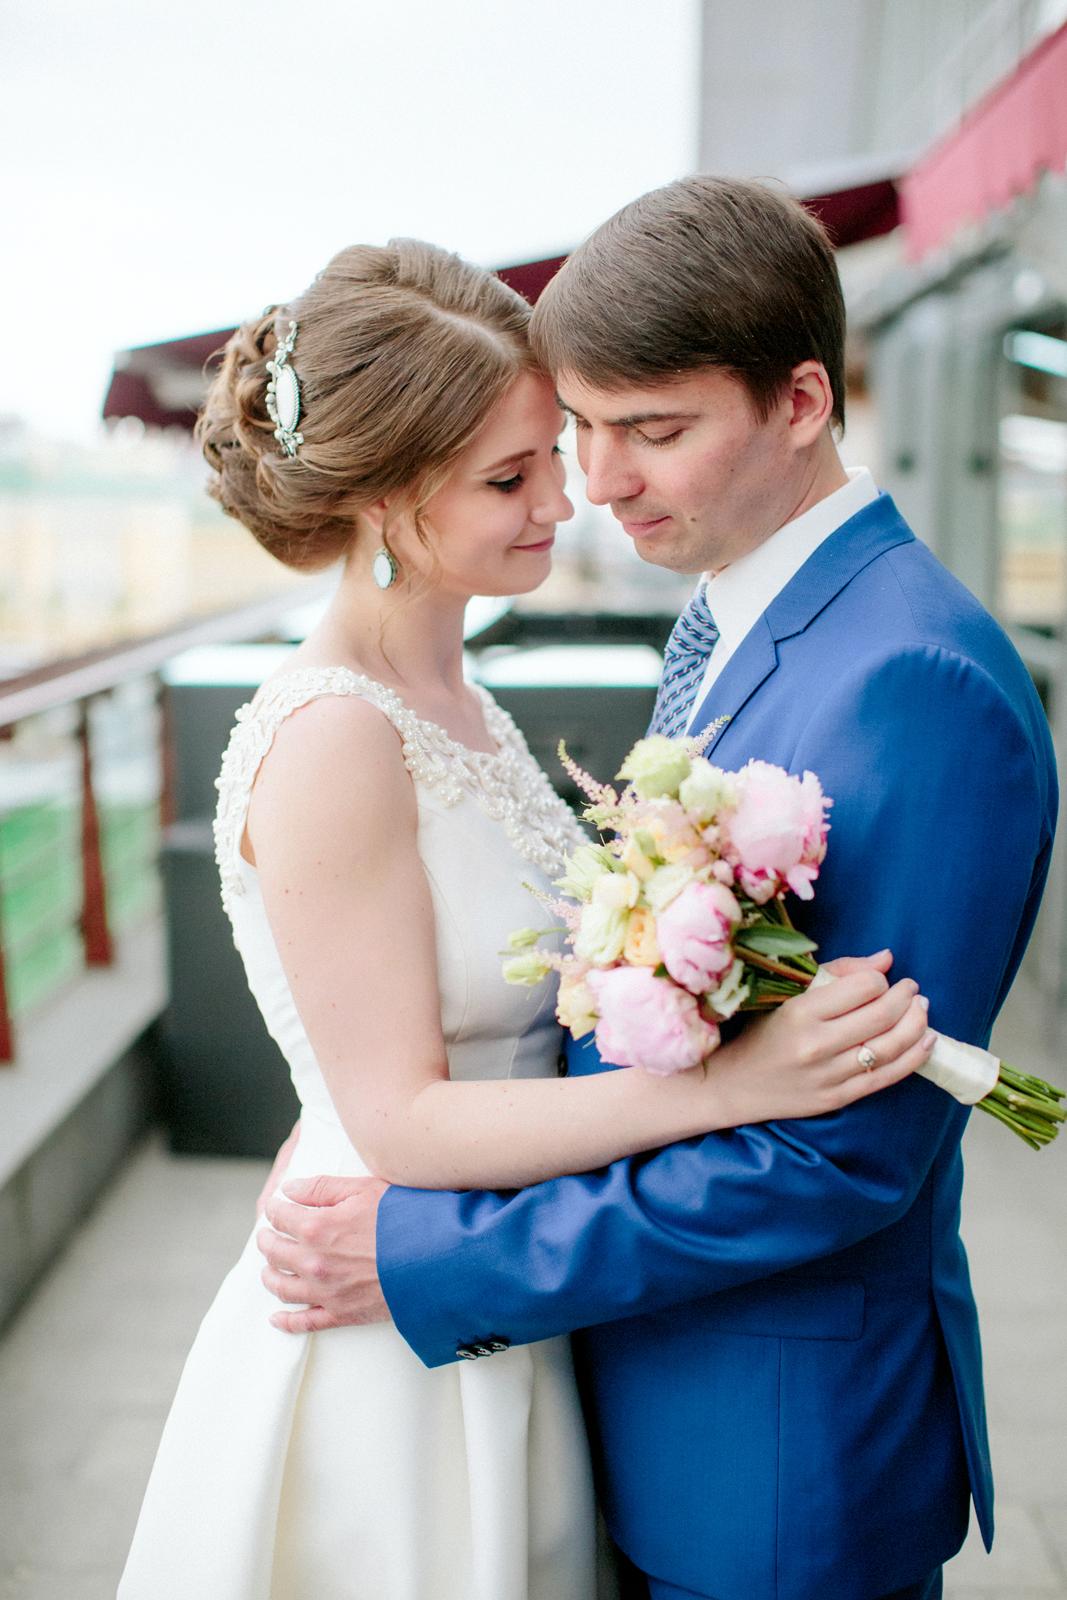 shapor photography wedding 20.05.2017-98